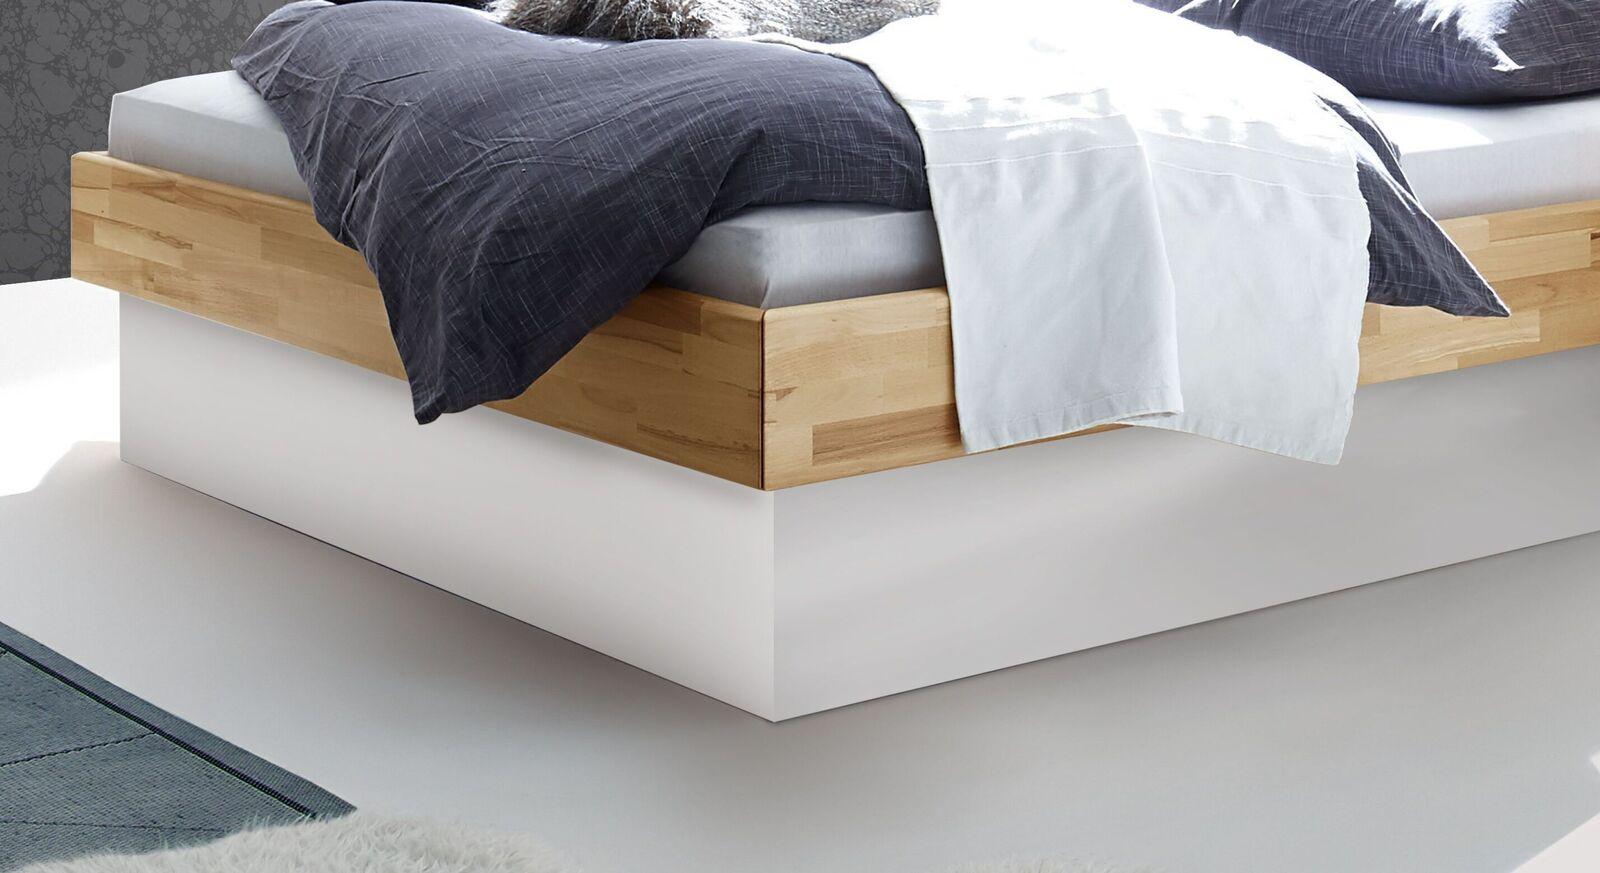 Bett Grosseto mit weißem MDF-Sockel